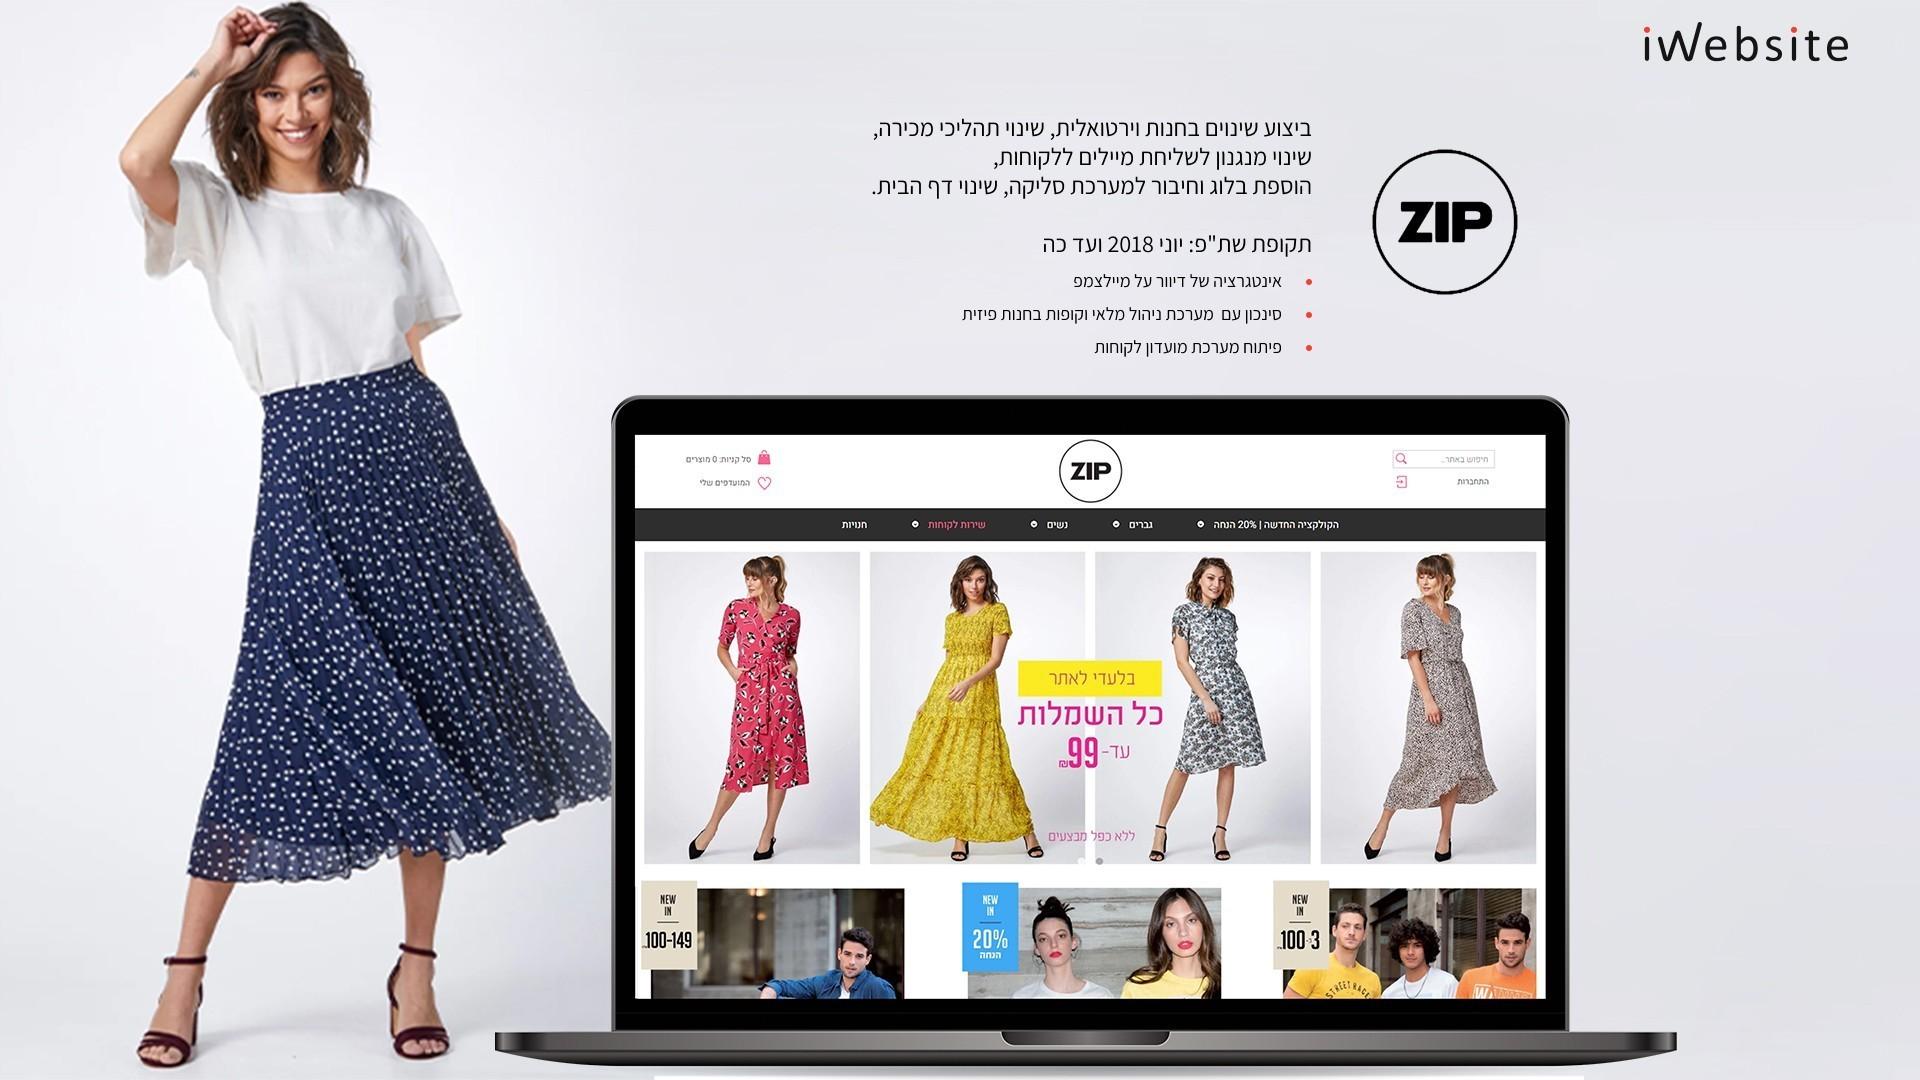 ZIP- חנות וירטואלית לאופנת נשים/גברים